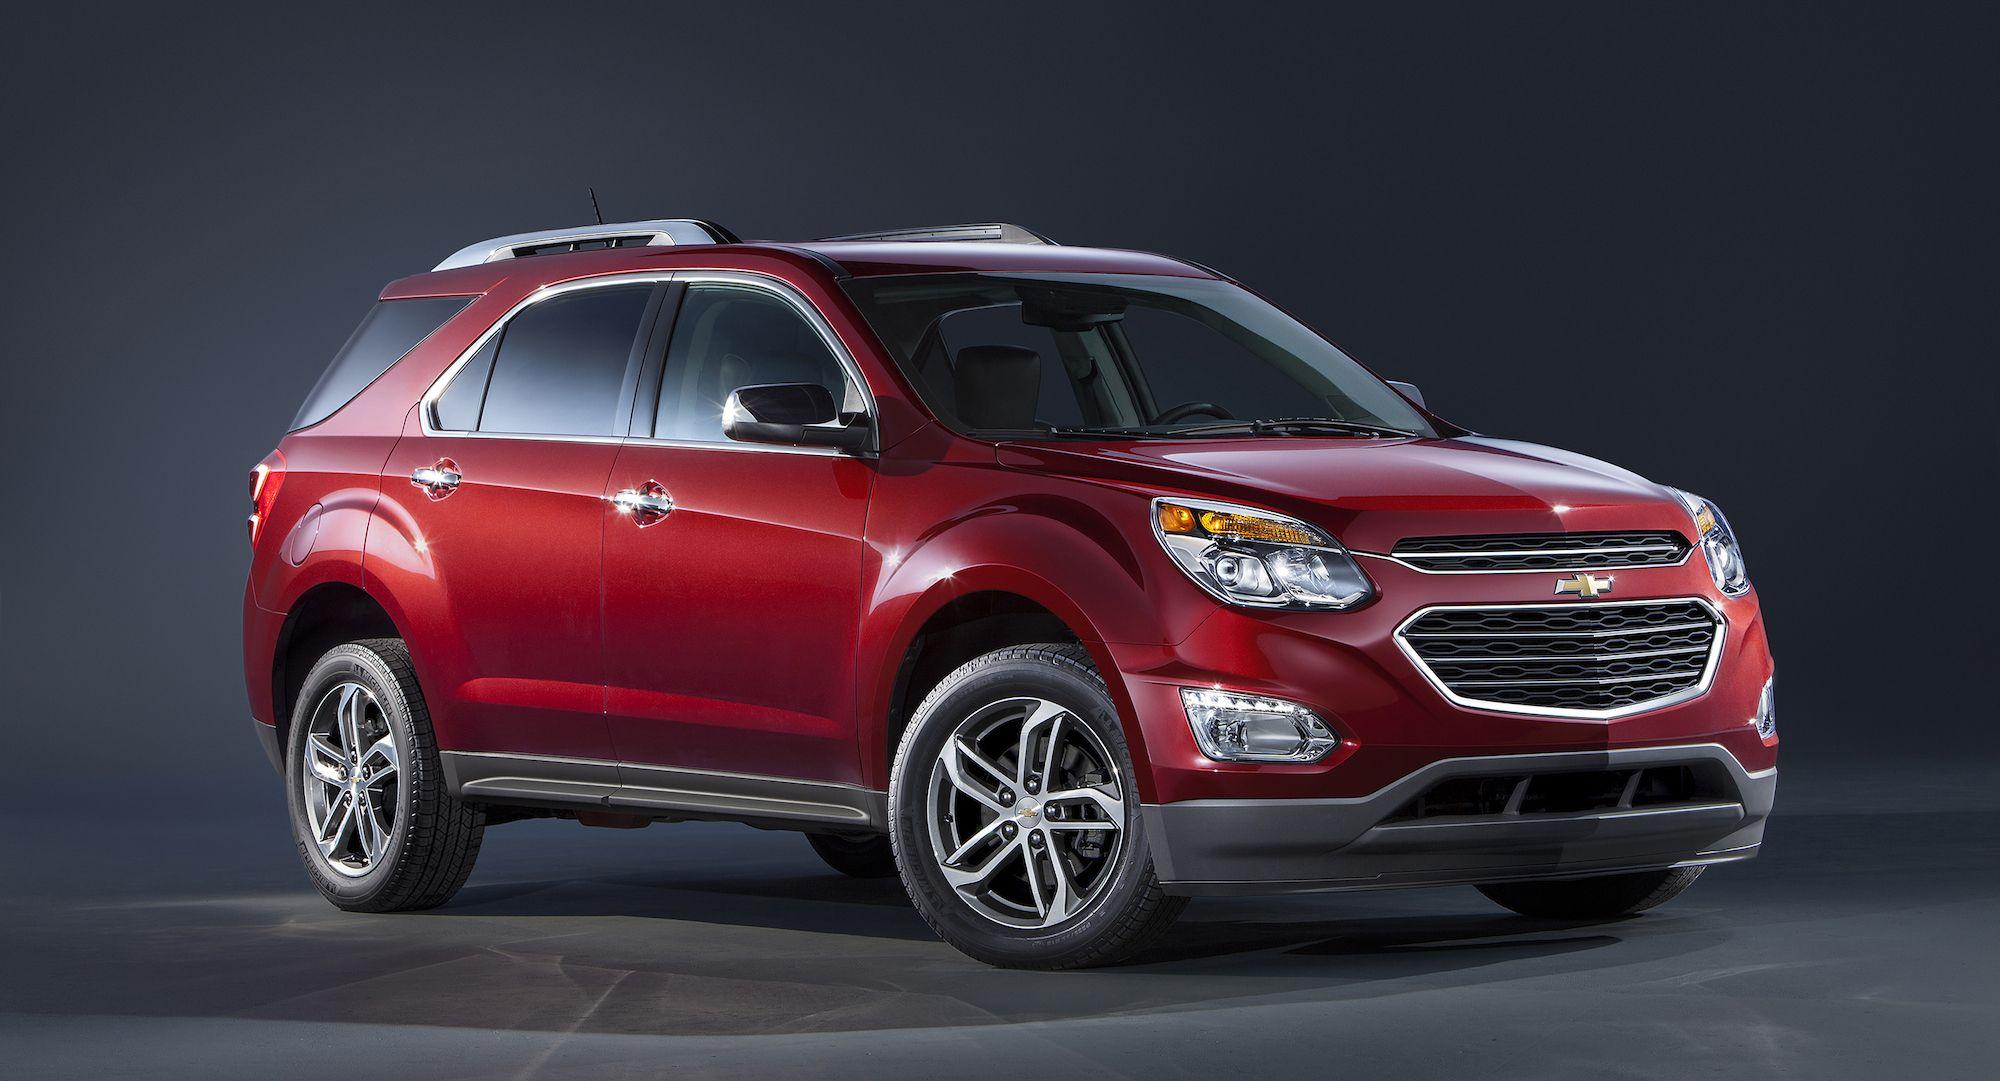 General Motors Announces Updates to 2016 Chevrolet Equinox